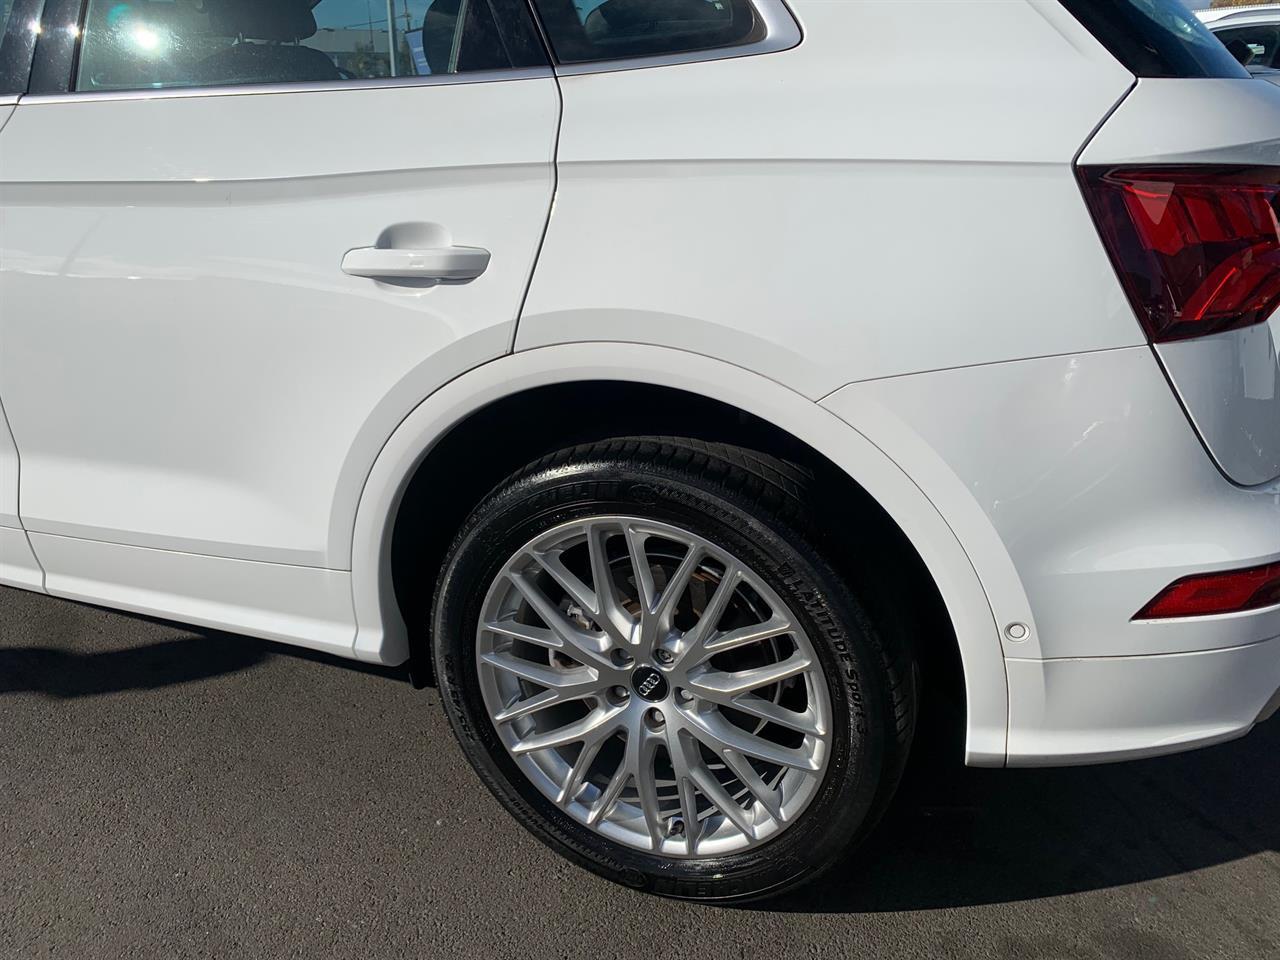 image-4, 2017 Audi Q5 2.0T FSI New Model Quattro at Christchurch